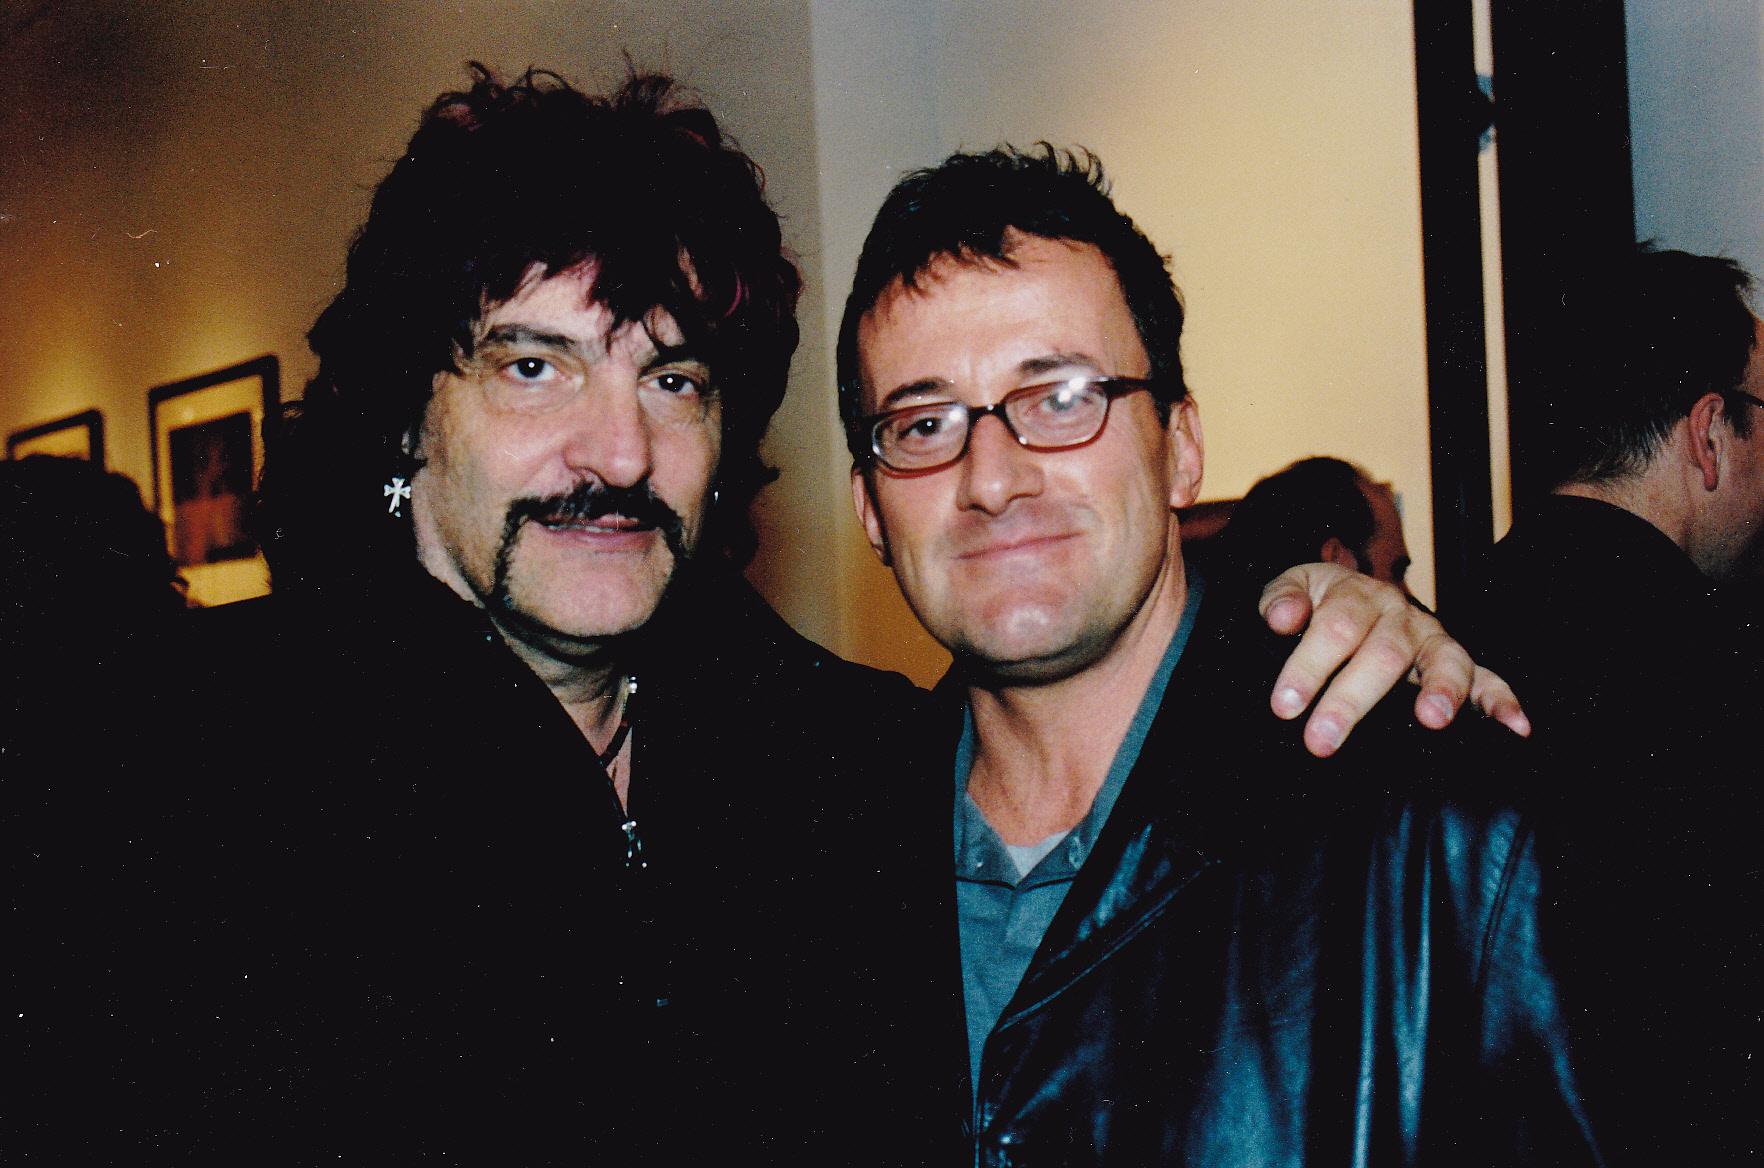 David with legendary Vanilla Fudge drummer Carmine Appice